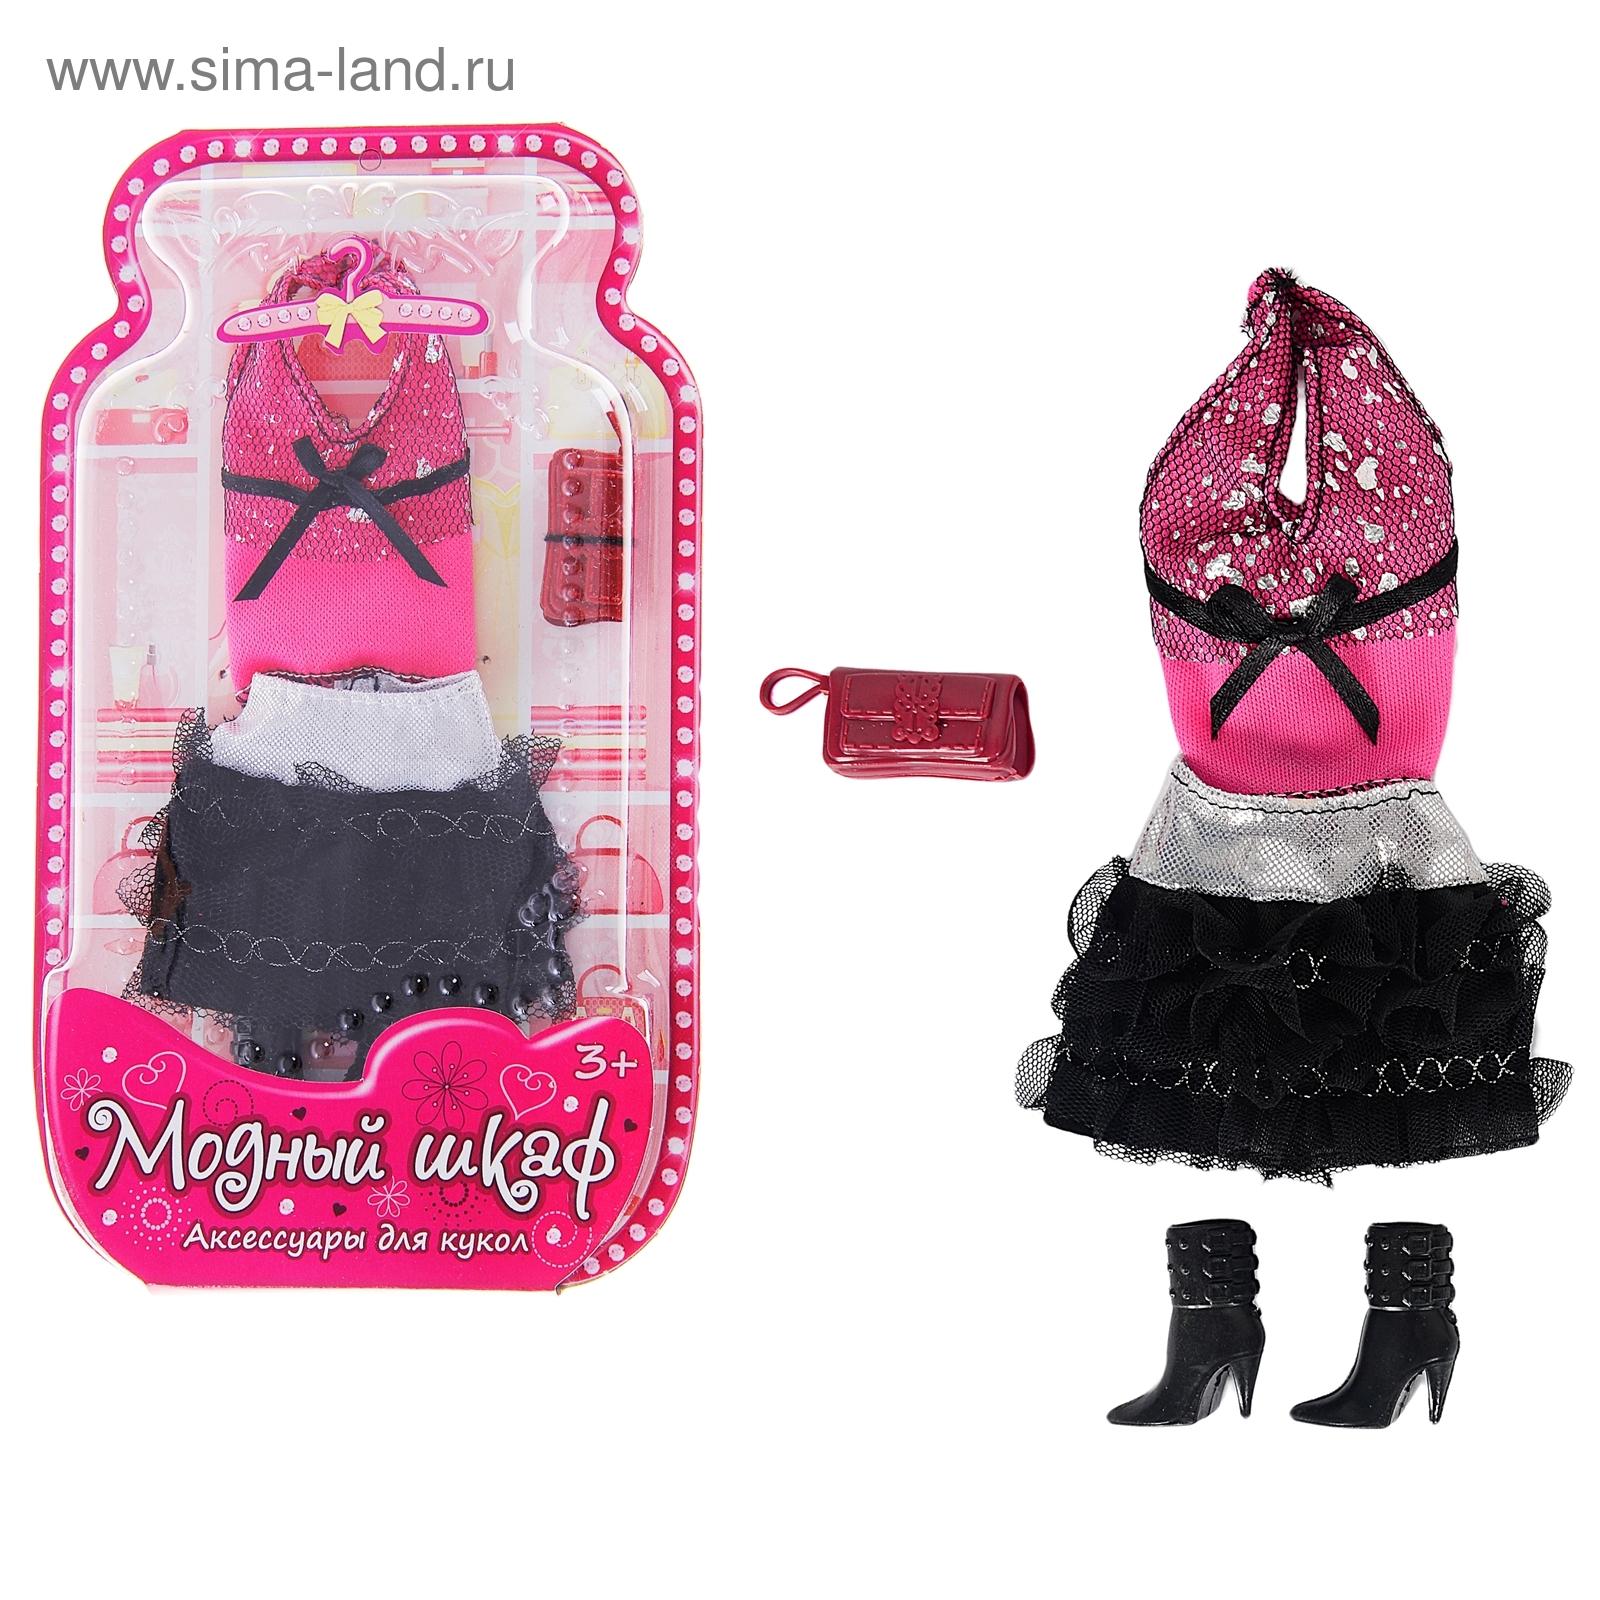 be8842007d6 Одежда для кукол